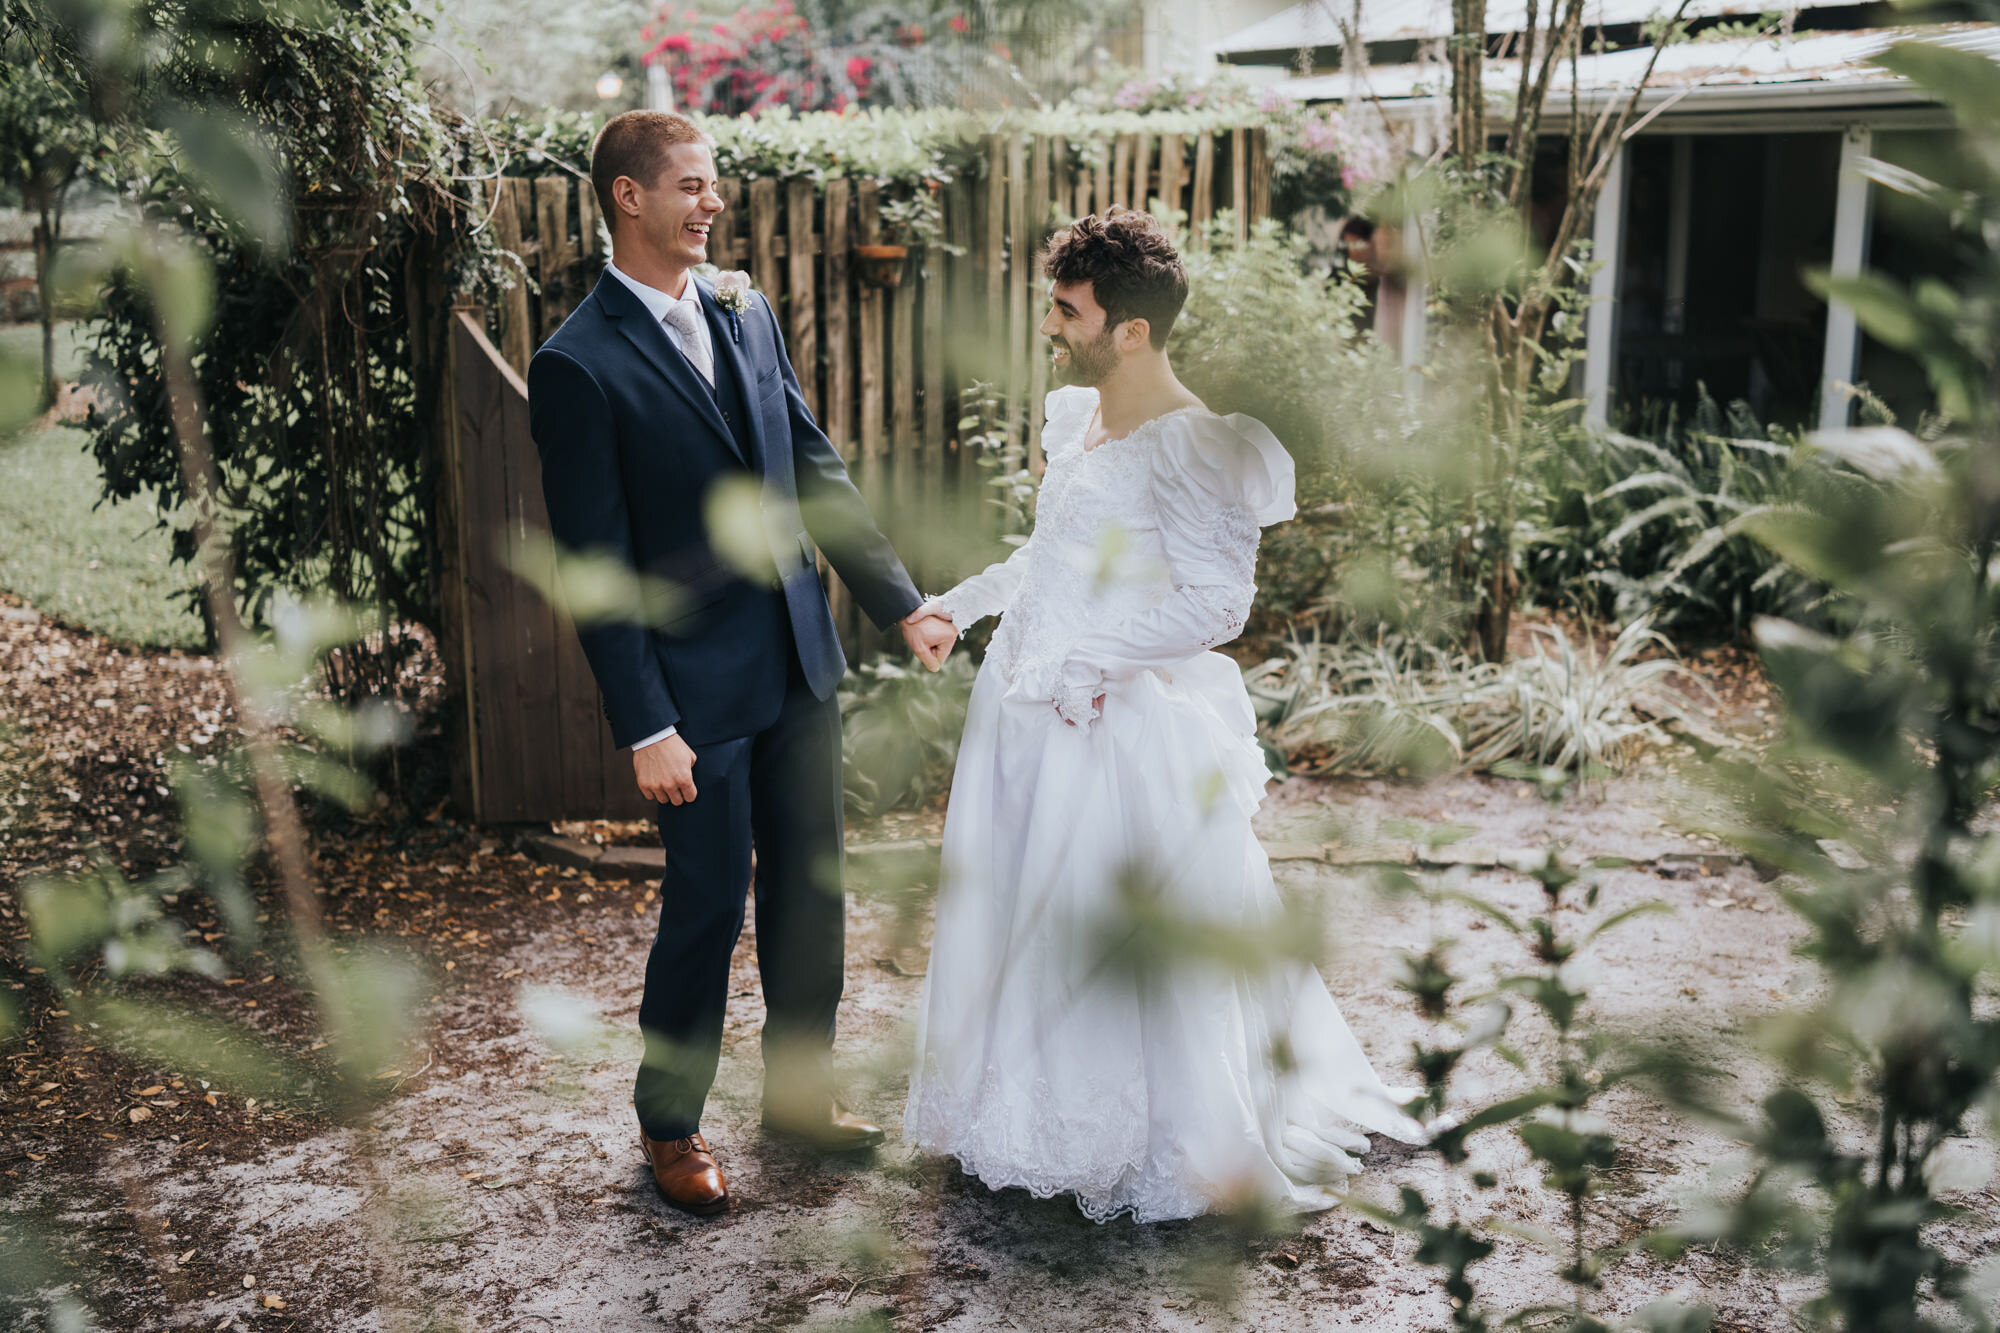 174Sean_Emily_Wedding_3-30-19.jpg